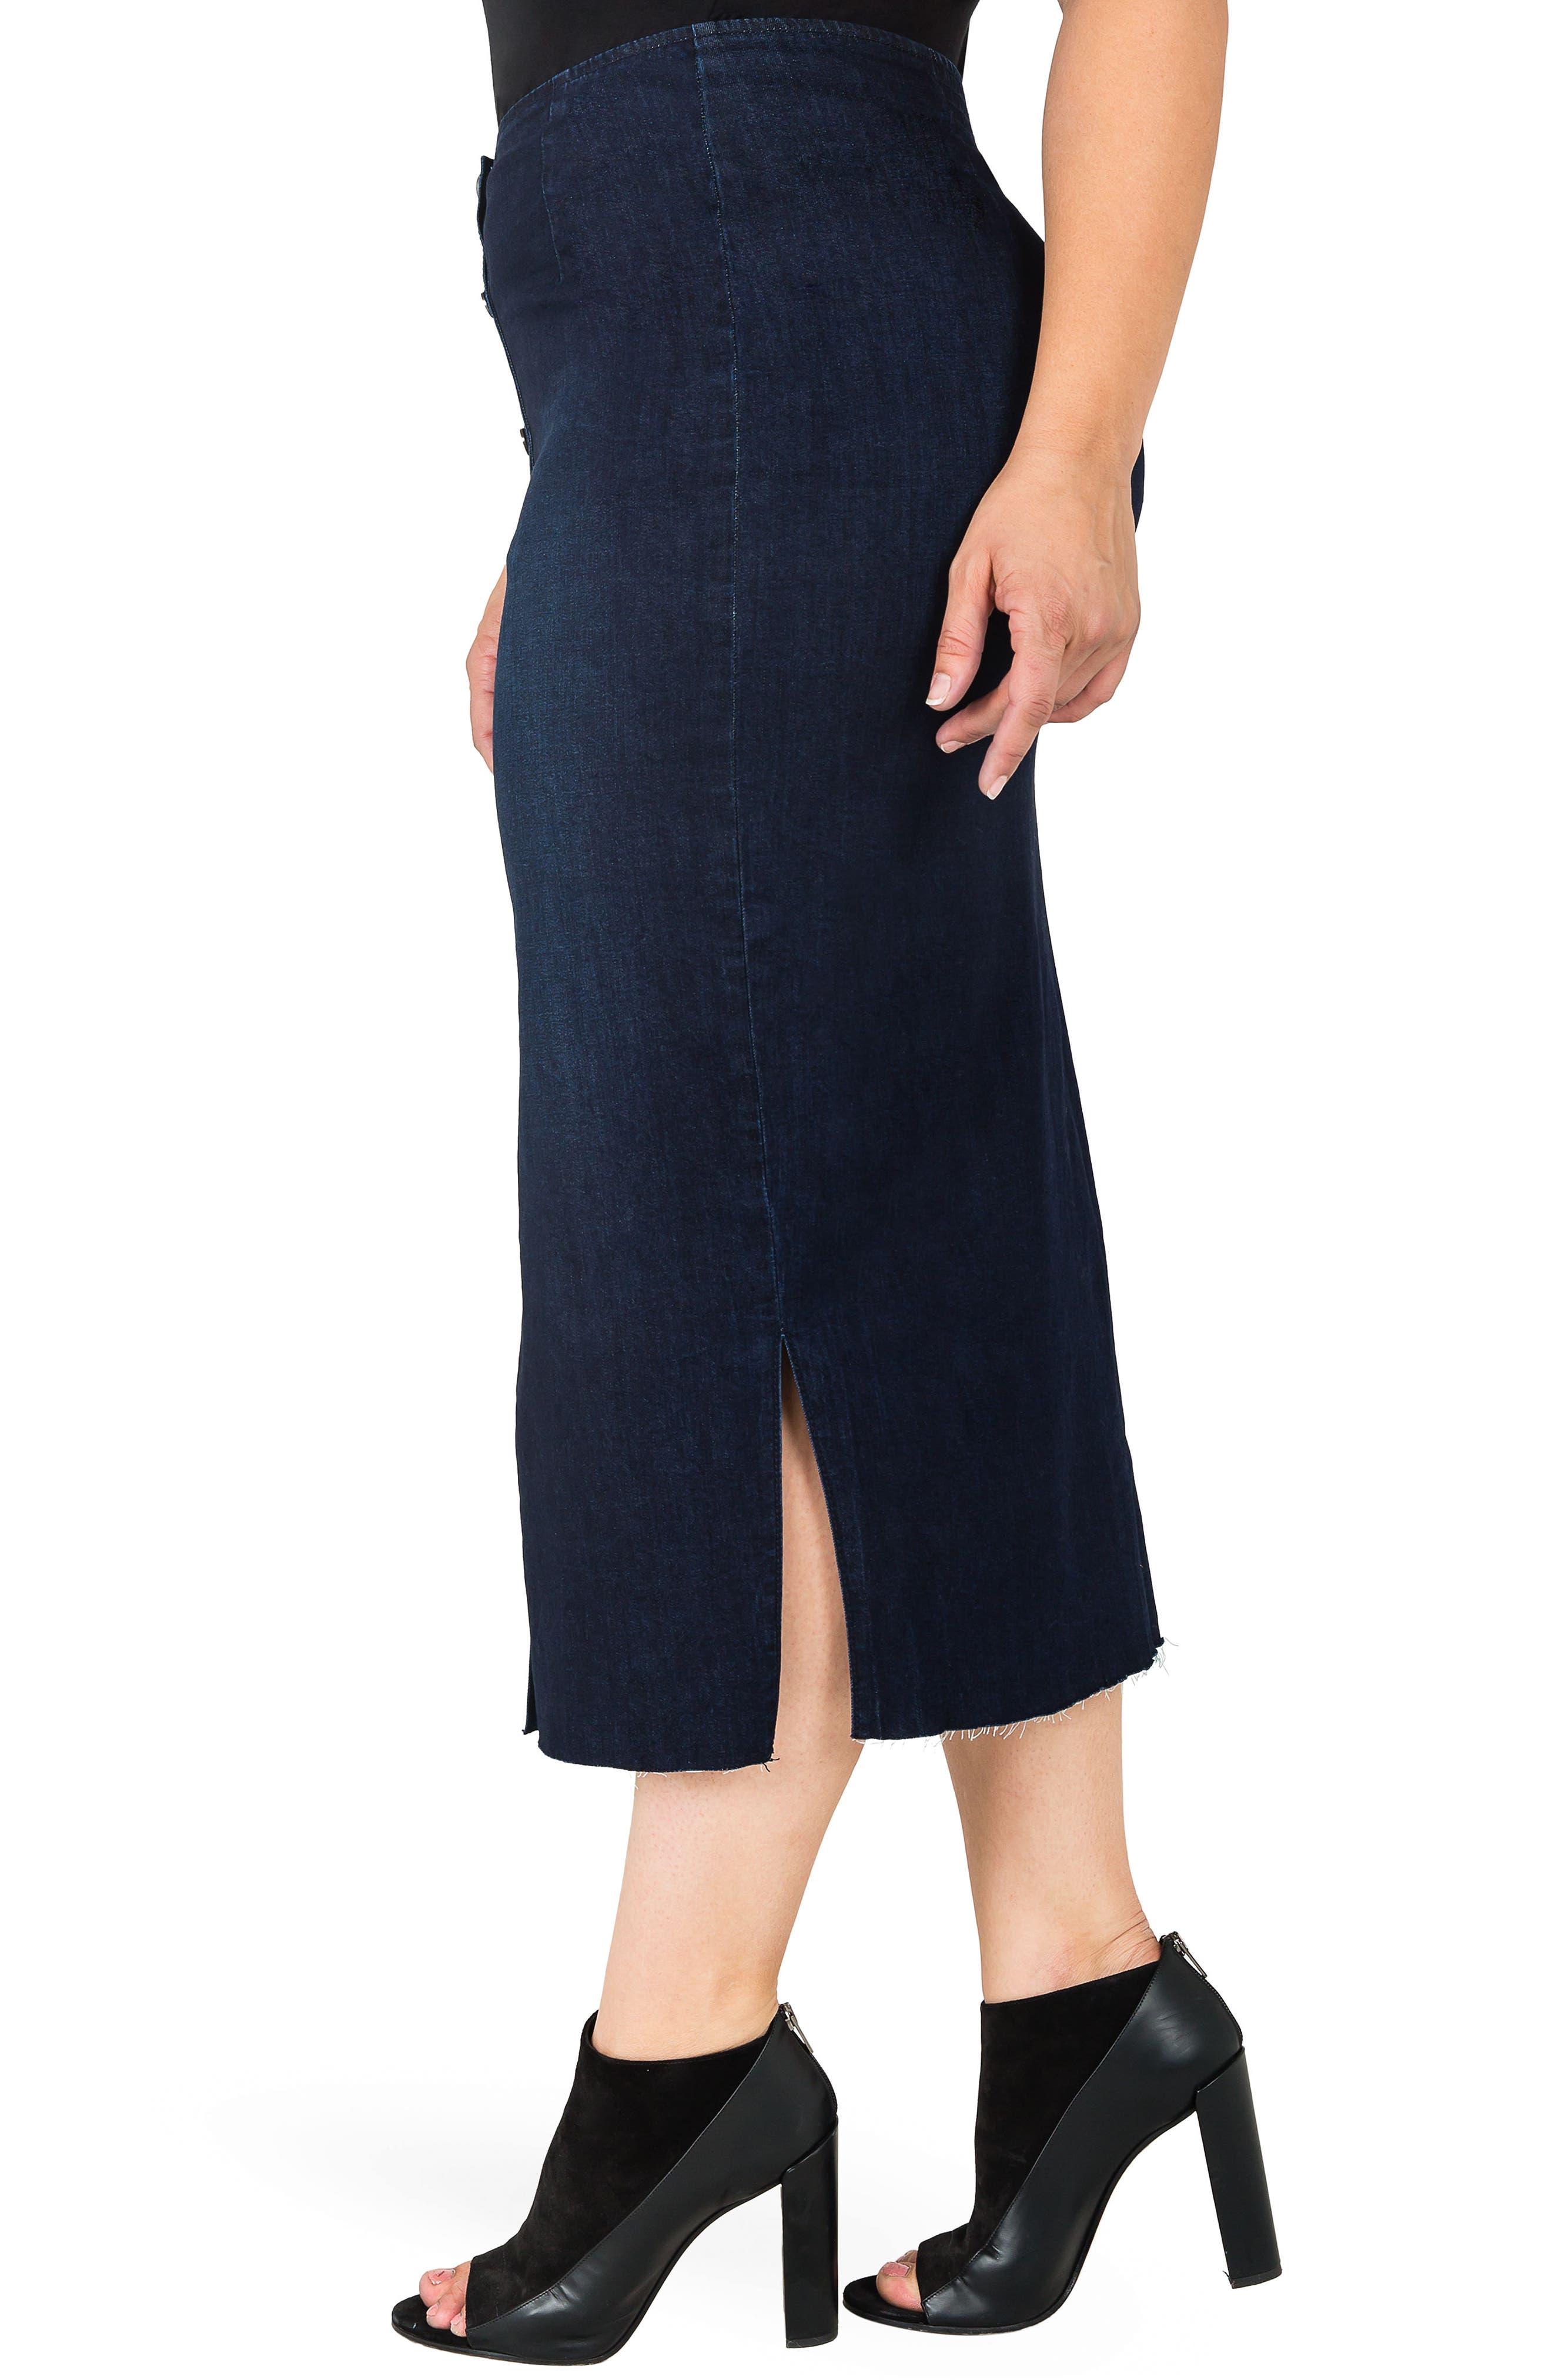 Elain Denim Pencil Skirt,                             Alternate thumbnail 3, color,                             BLUE